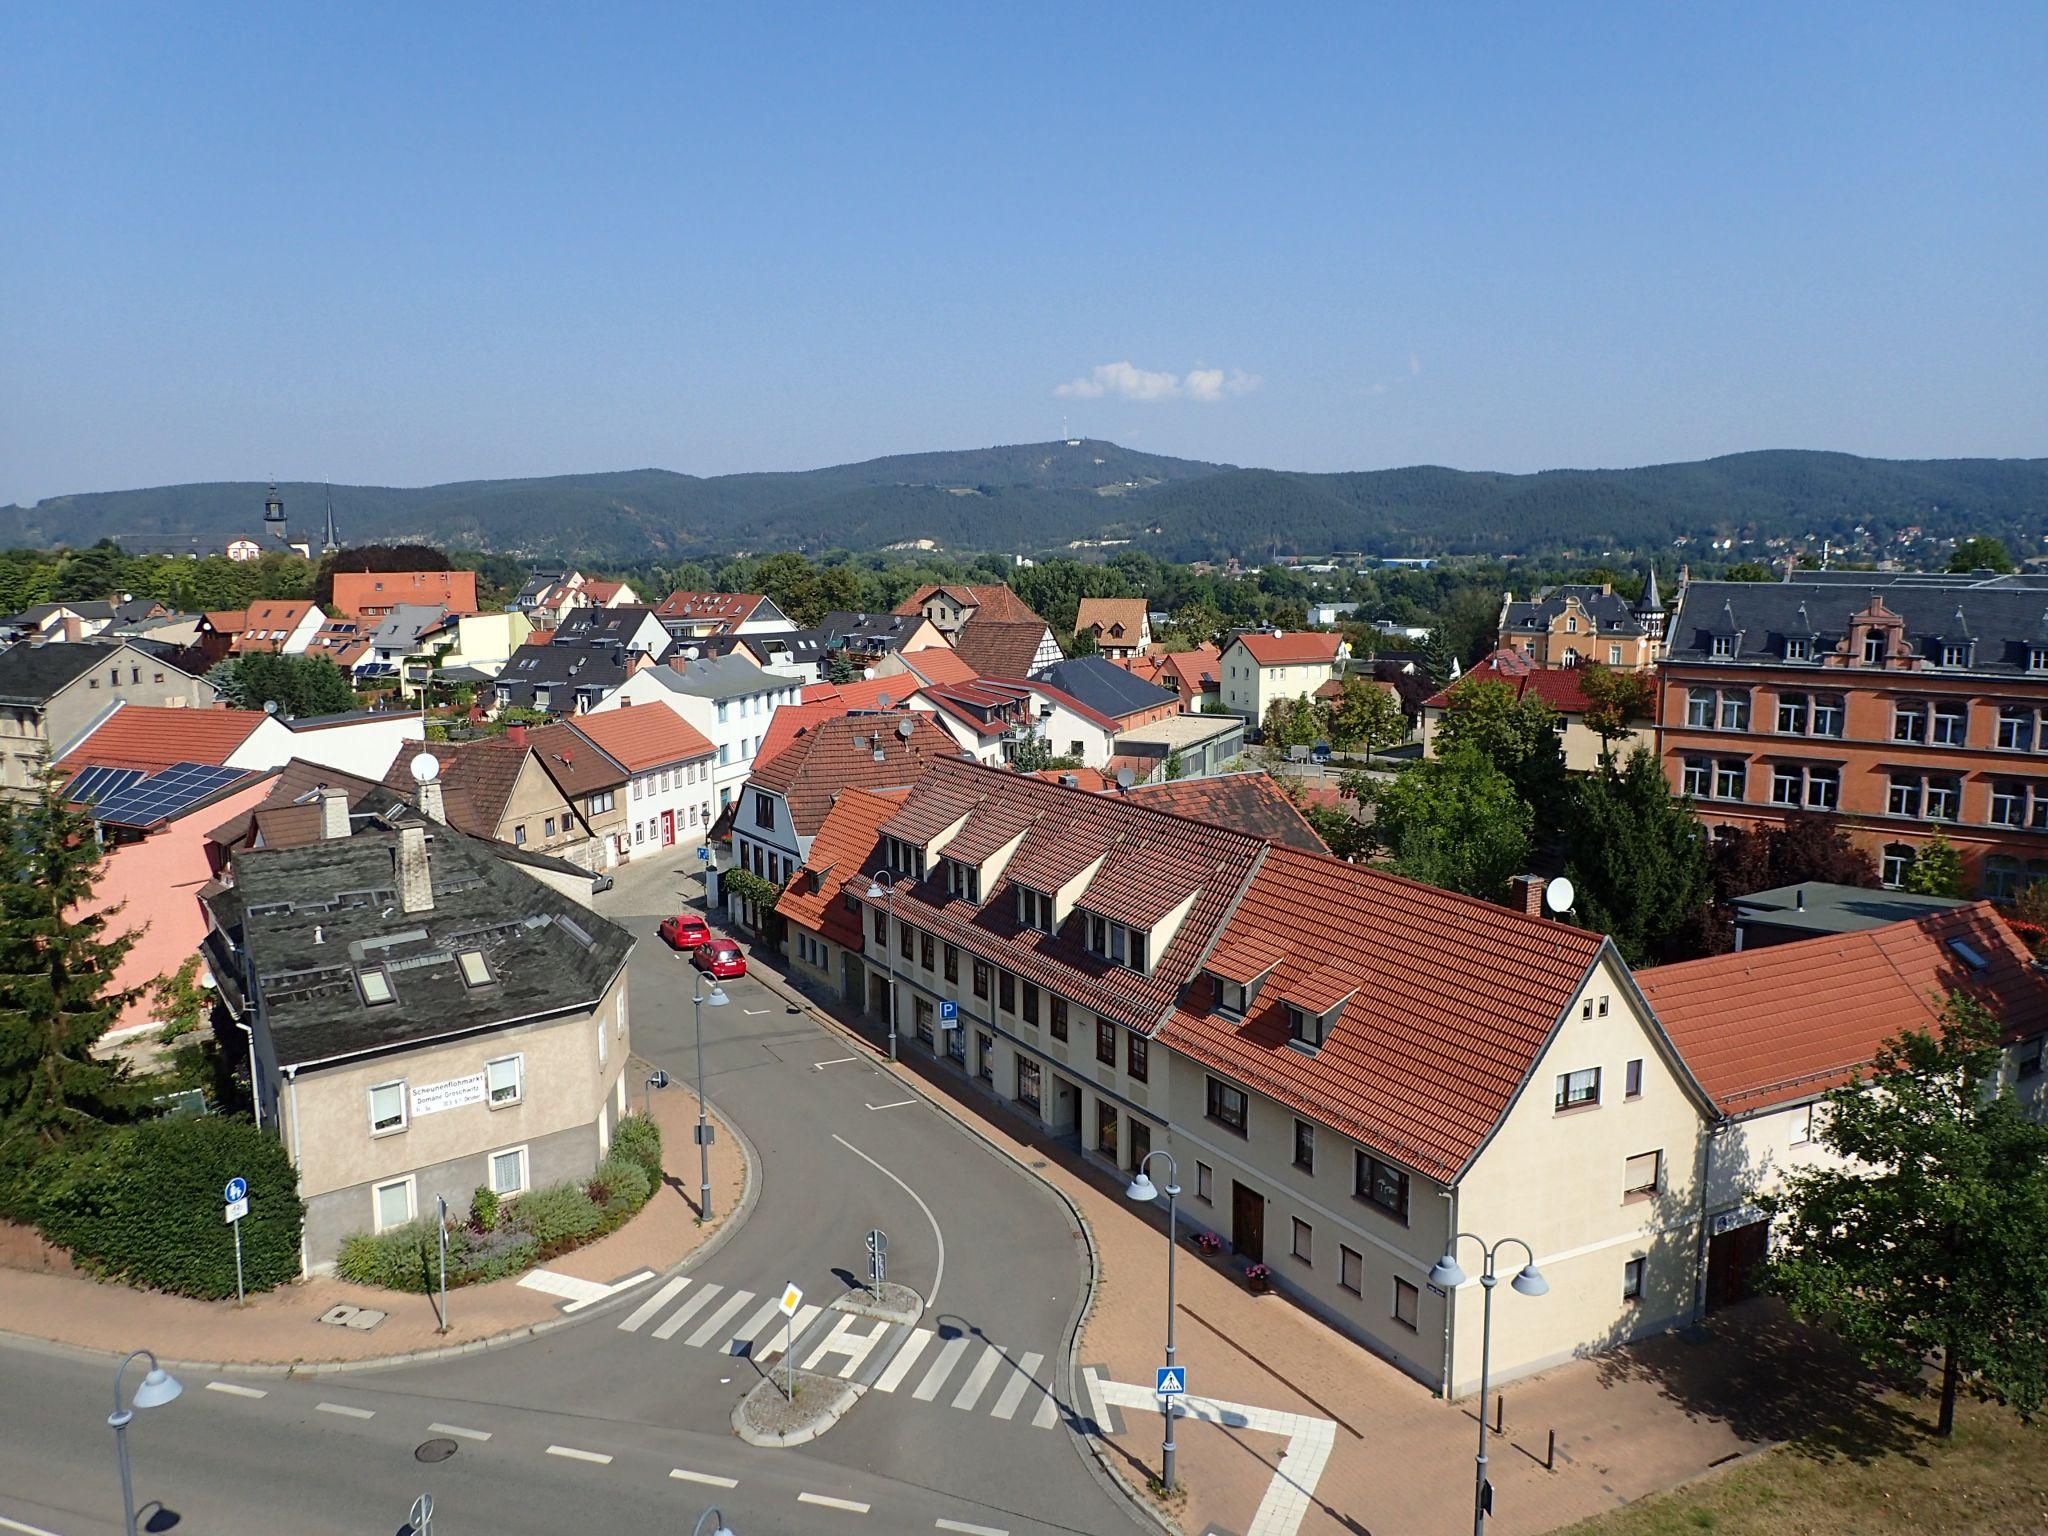 Ausblick vom Darrtor, Germany